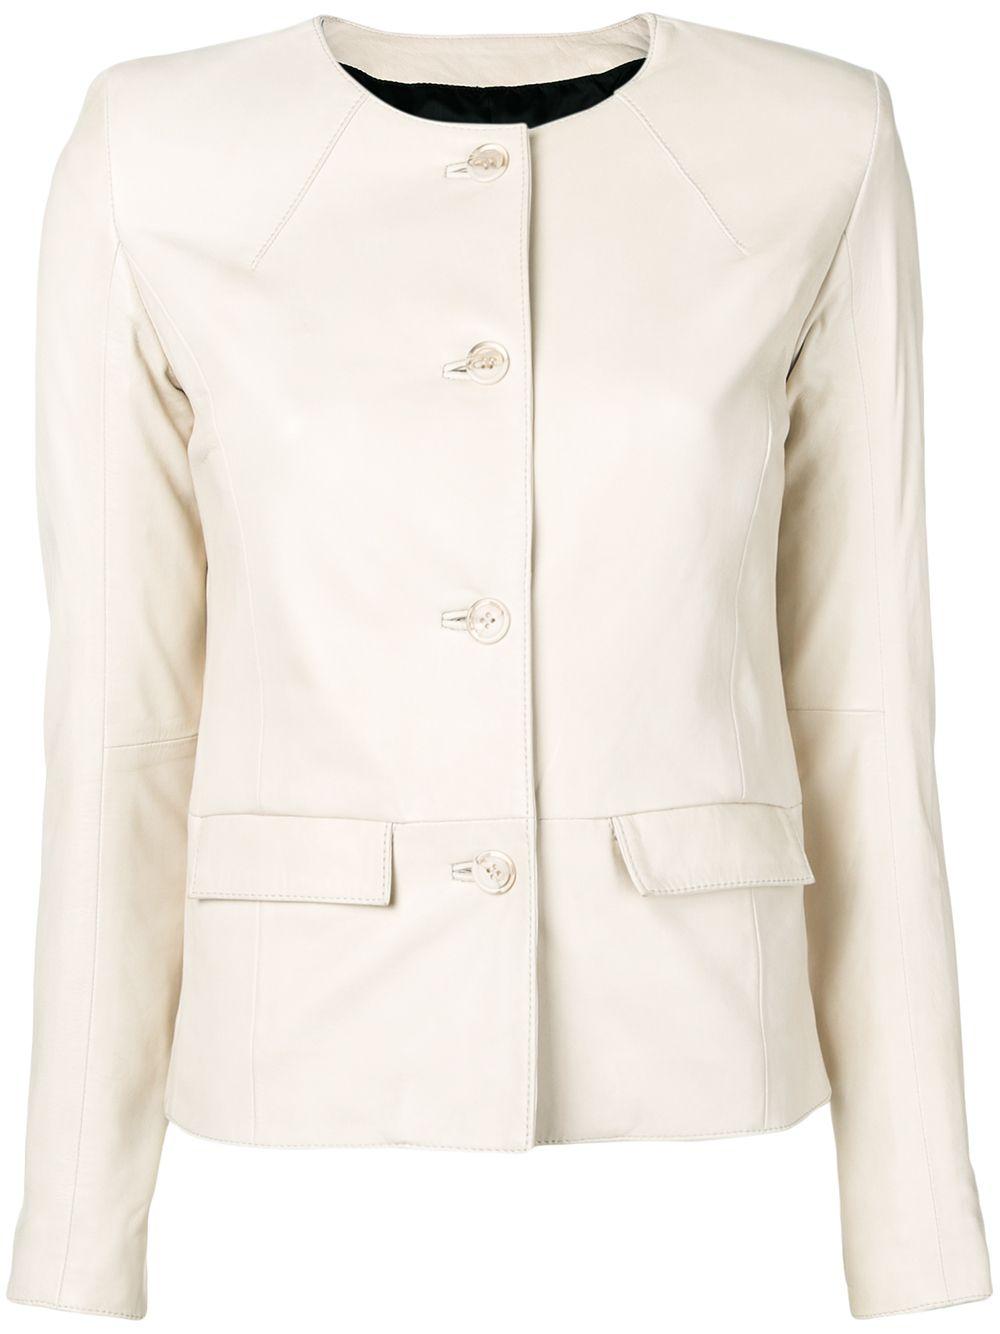 S.W.O.R.D 6.6.44 | приталенный пиджак на пуговицах | Clouty